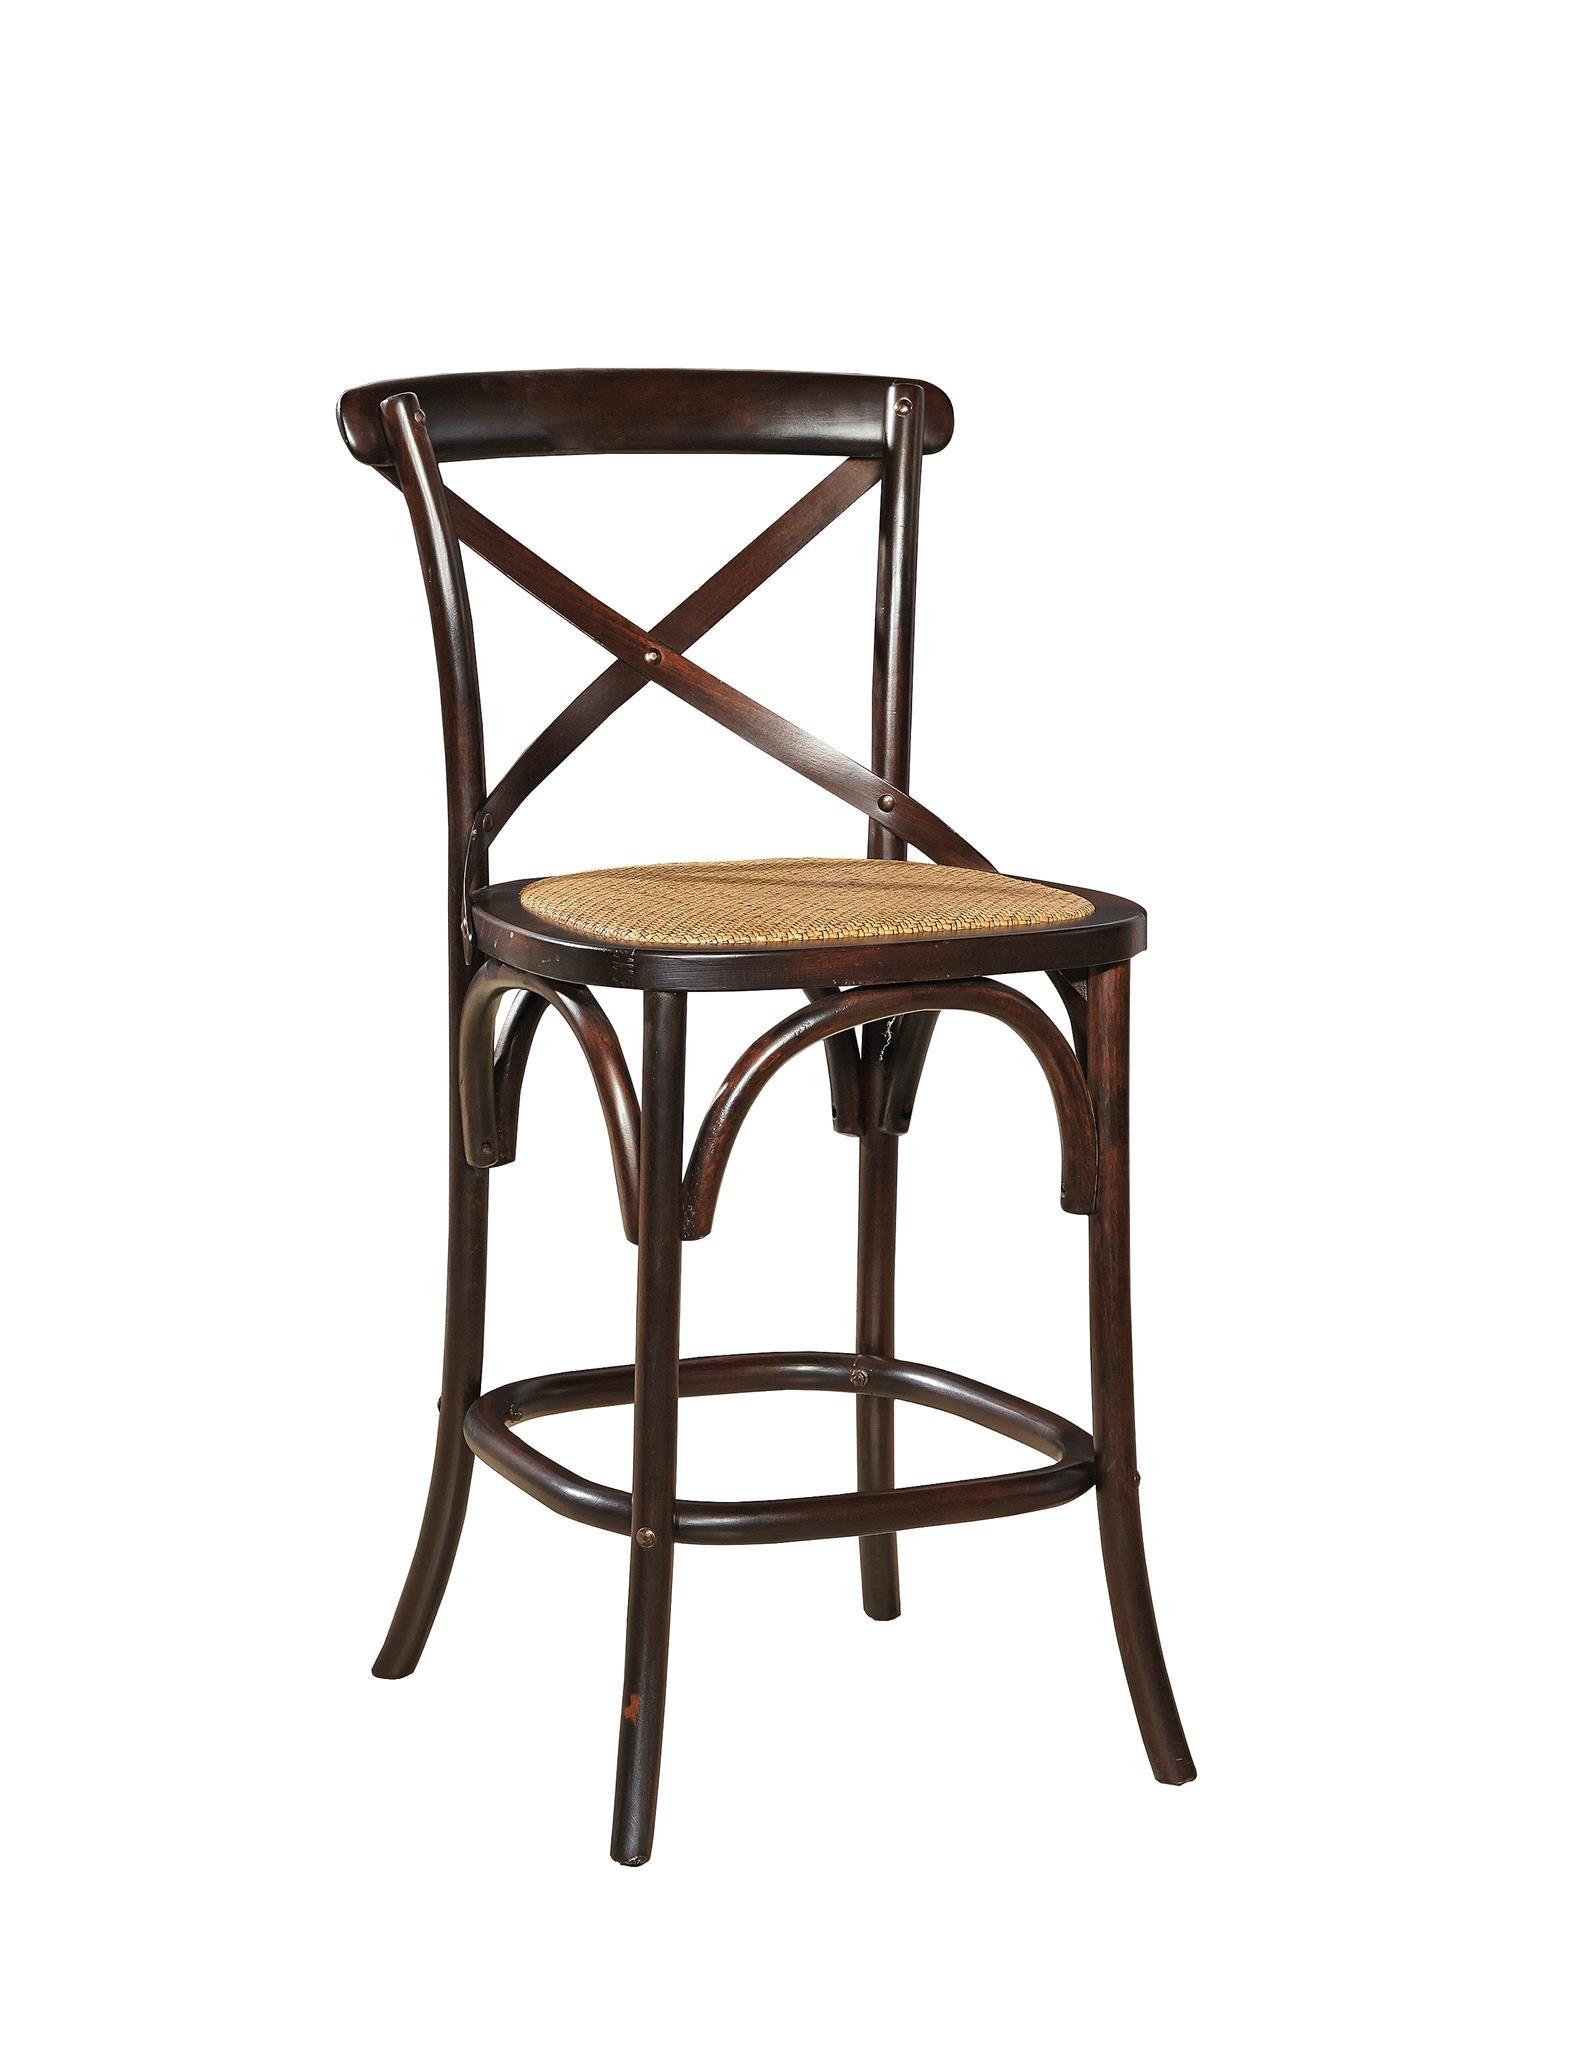 Charmant Furniture Classics, LTD Bentwood Counter Stool 521438